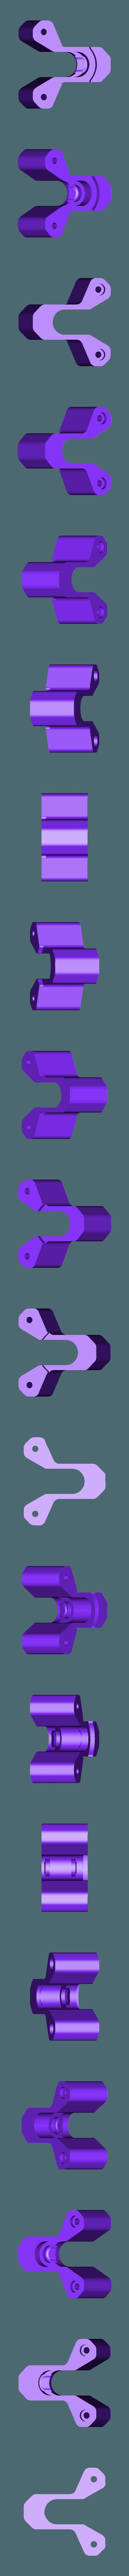 Gearhead_v2-0_96.STL Download free STL file Extruder Mount (Printrbot Gear Head) • 3D printable design, WalterHsiao